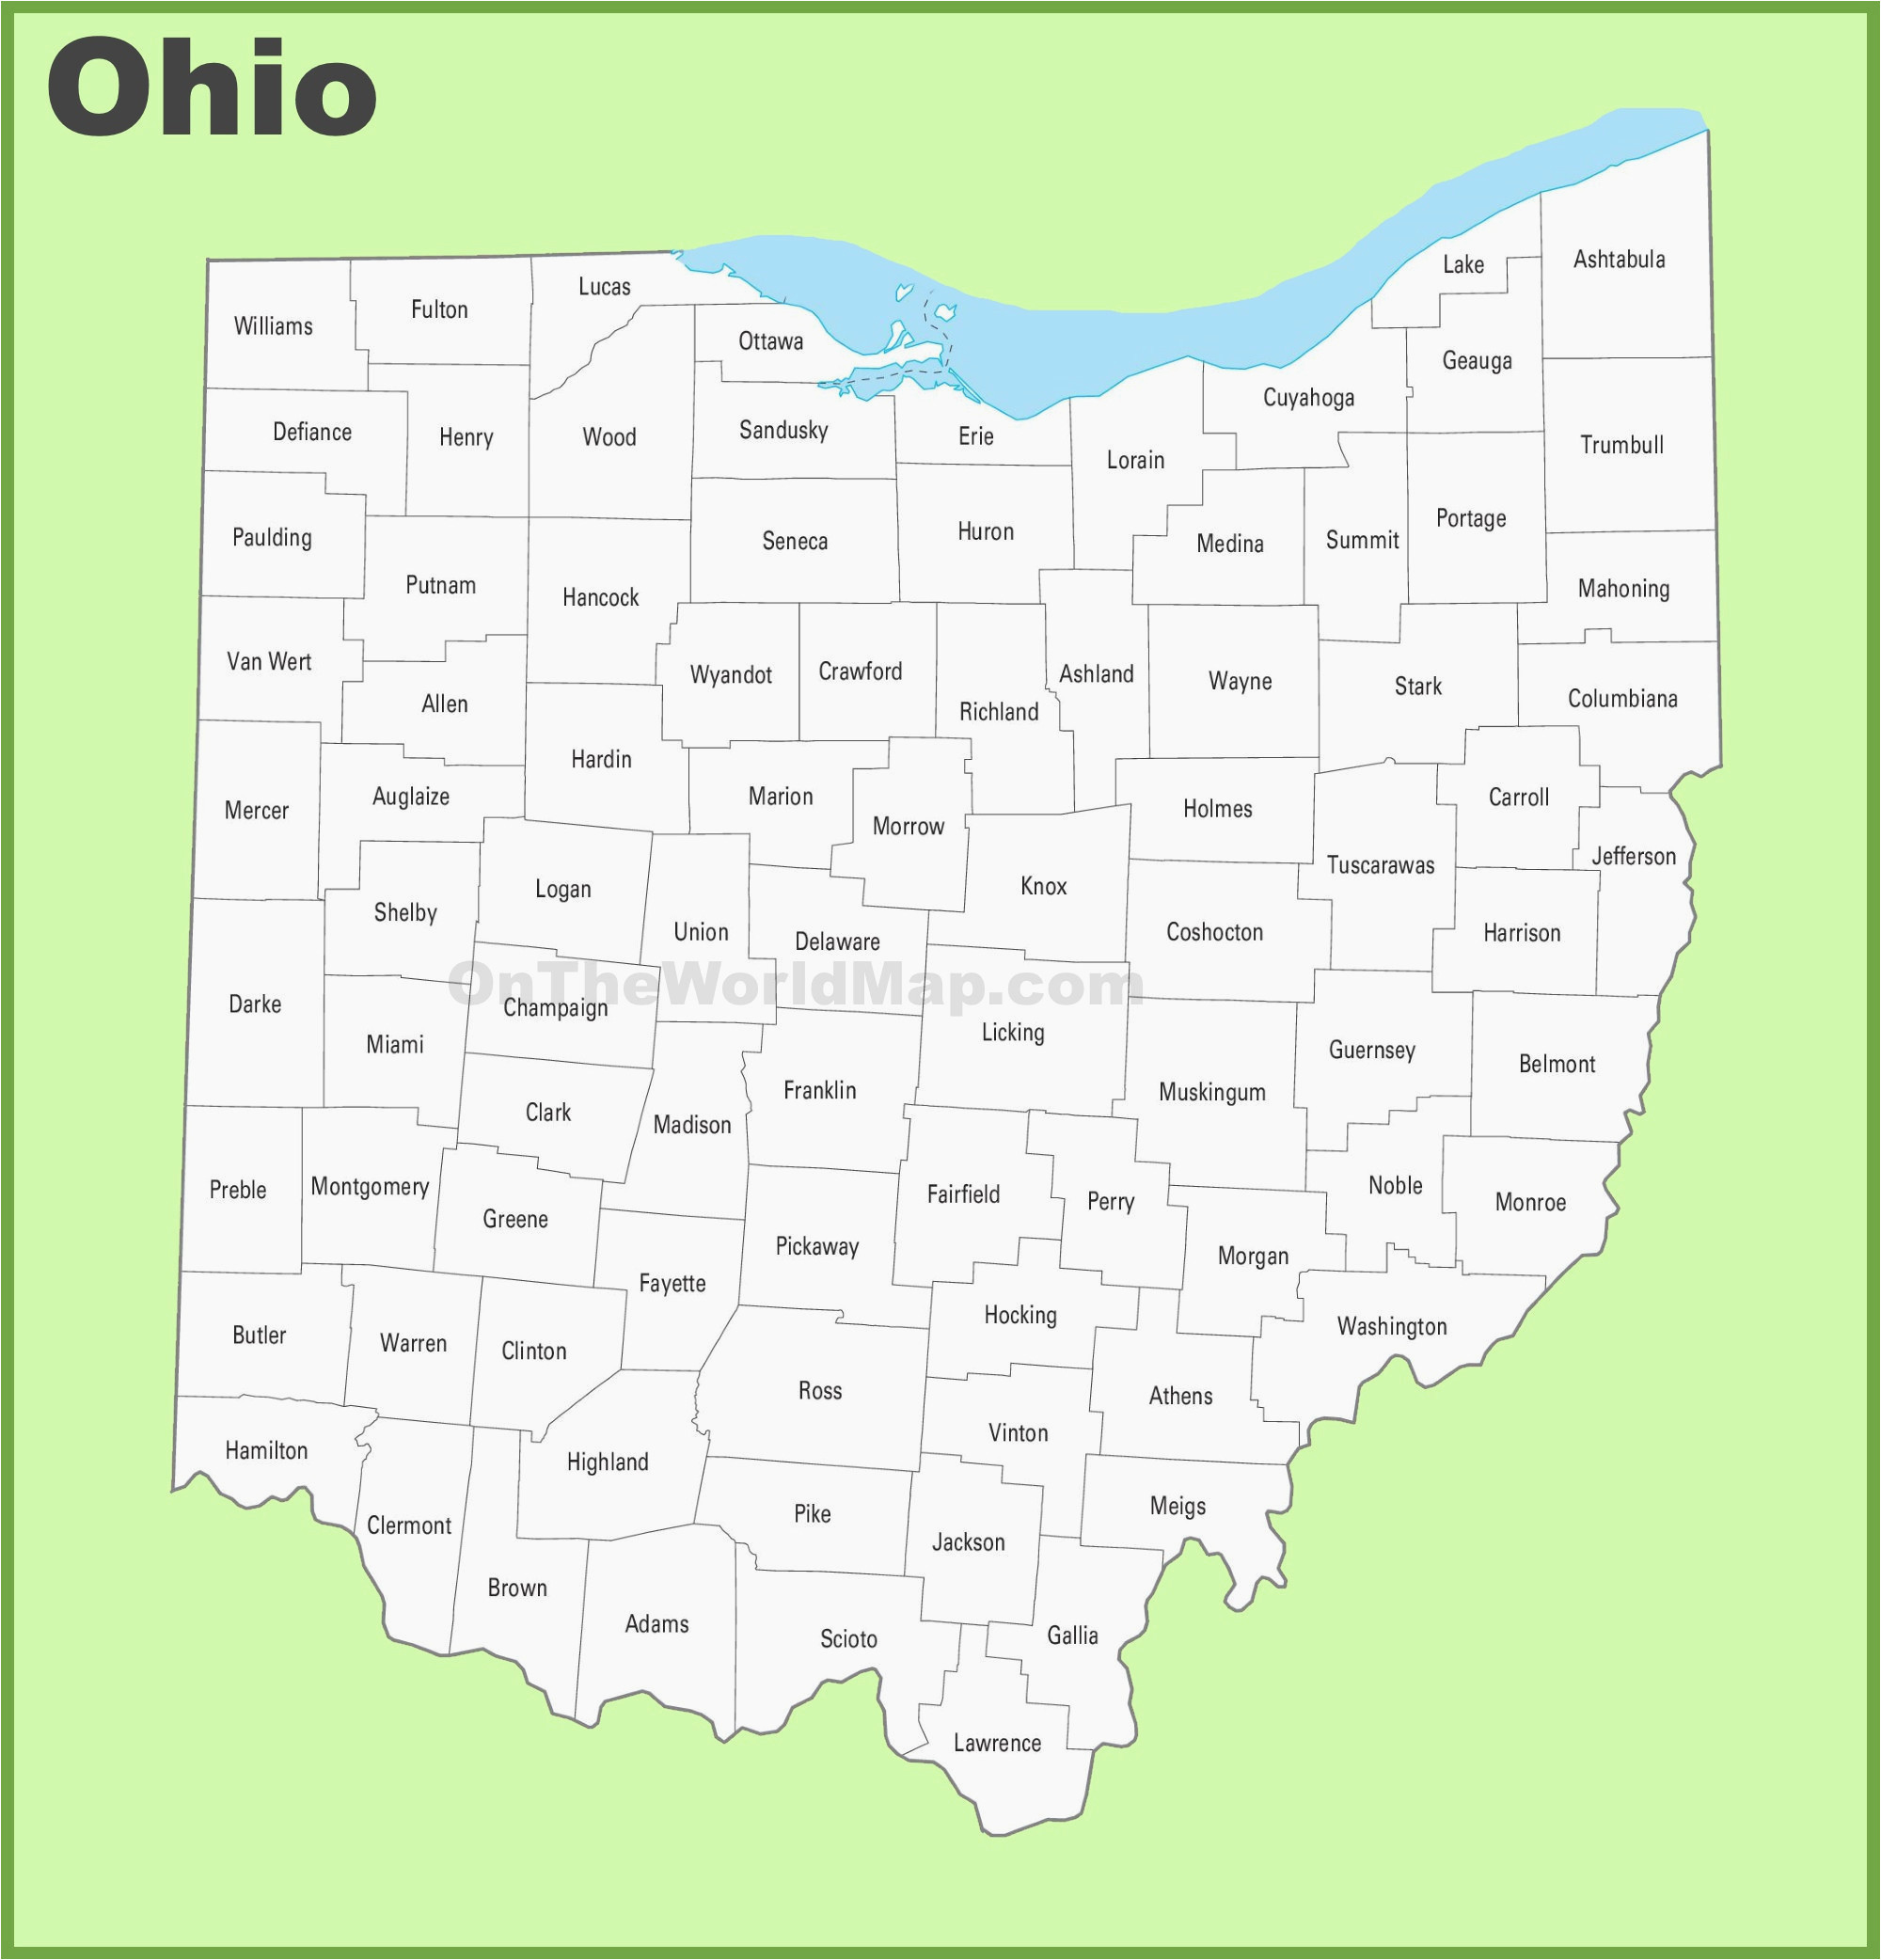 Map Of ashland Ohio ashland County Ohio township Map 29 ... Map Of Ashland County Ohio on map of warren ohio, crawford county, map of united states ohio, map of jeromesville ohio, map of ashland ohio area, map of cincinnati ohio, hancock county, allen county, map of clear creek township ohio, adams county, map of mifflin township ohio, holmes county, map of chippewa ohio, map of parma ohio, map of broadview heights ohio, map of lebanon ohio, richland county, map of milton township ohio, franklin county, map of canton ohio, clark county, map of beloit ohio, cuyahoga county, map of perry township ohio, knox county, map of orange township ohio, lorain county, wayne county, lake county, medina county, map of ashtabula ohio, erie county, map of west chester ohio, map of cuyahoga river ohio, delaware county, fairfield county, marion county, map of madison ohio,